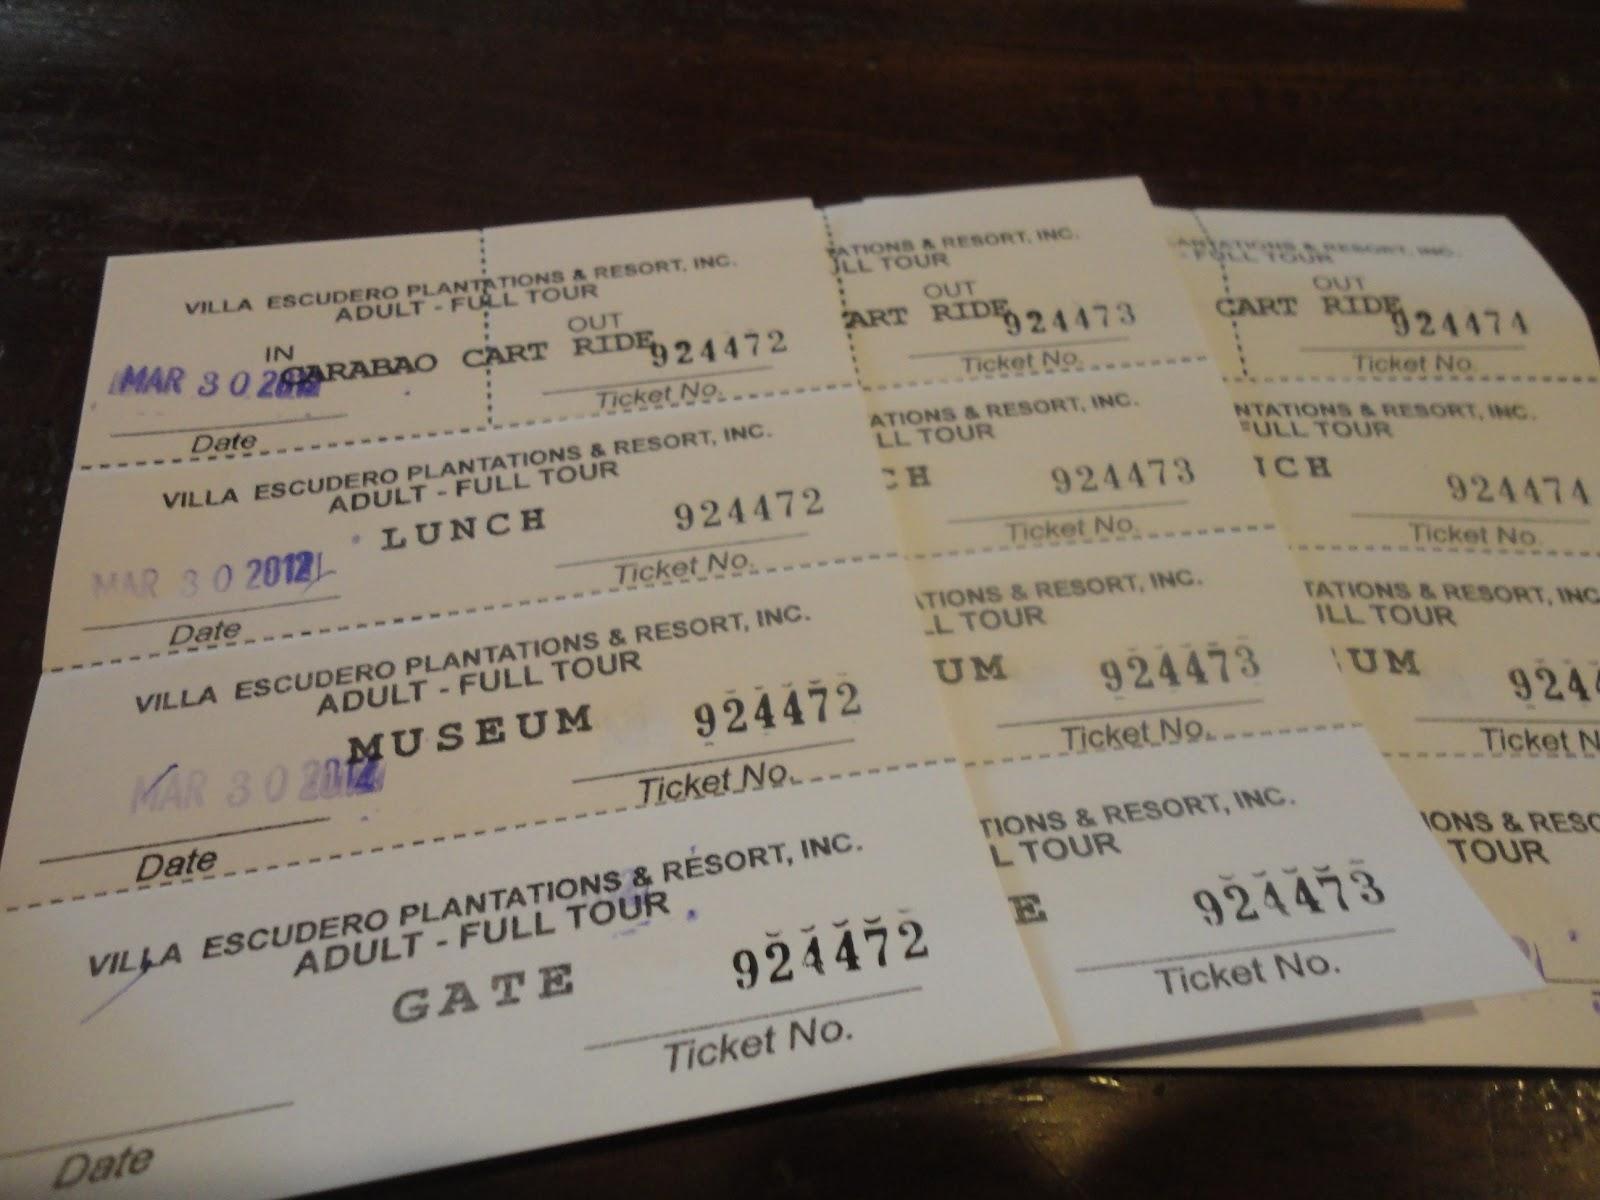 ... : Villa Escudero Plantations and Resort - Day Tour Itinerary